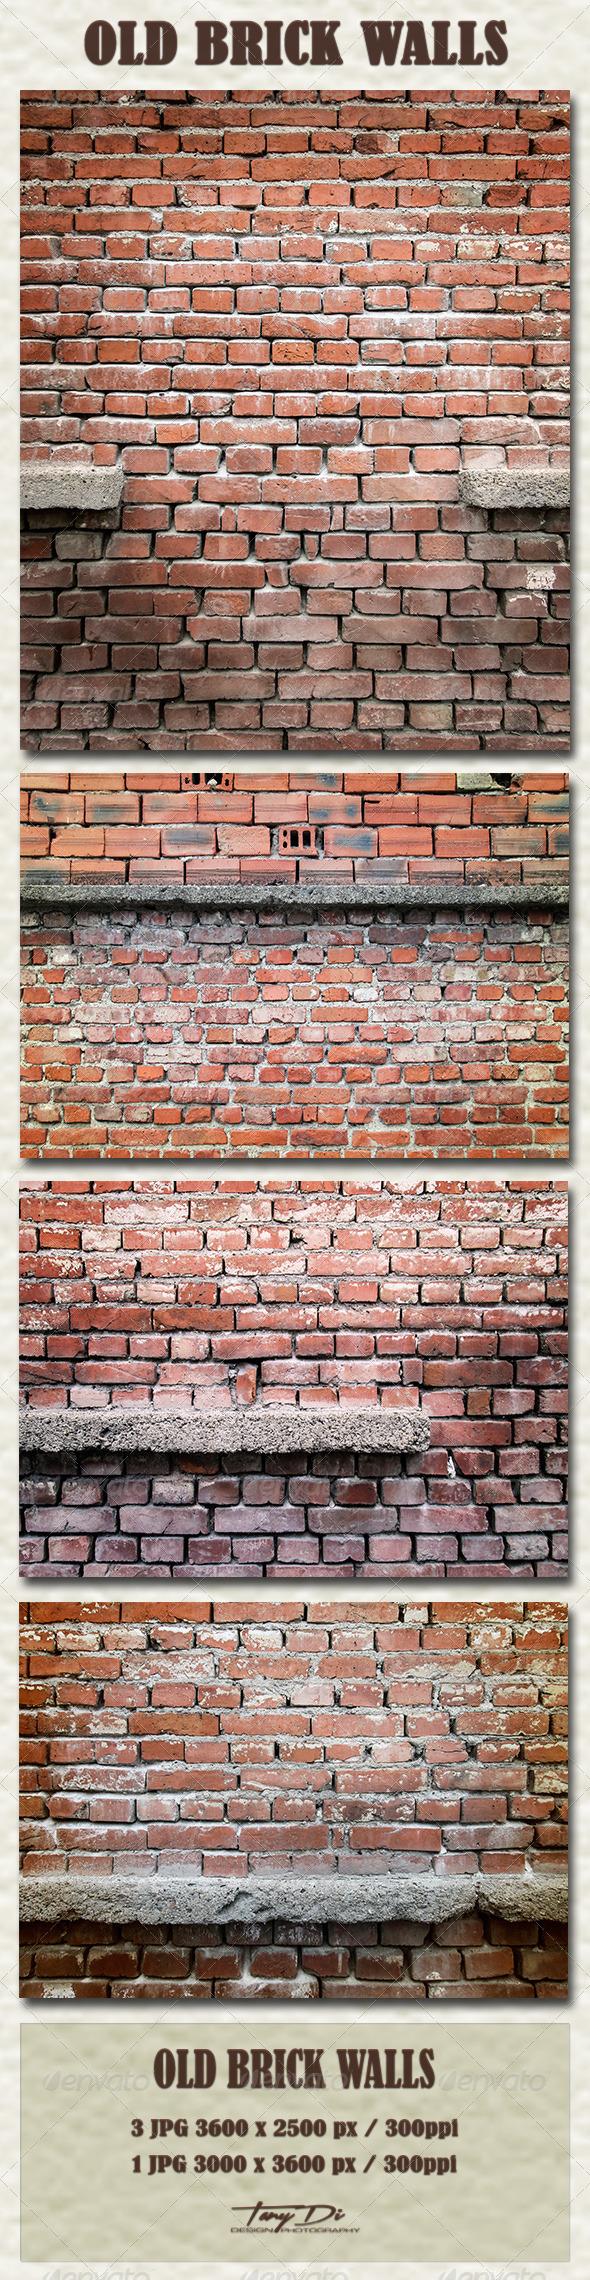 GraphicRiver Old Brick Walls 5373916